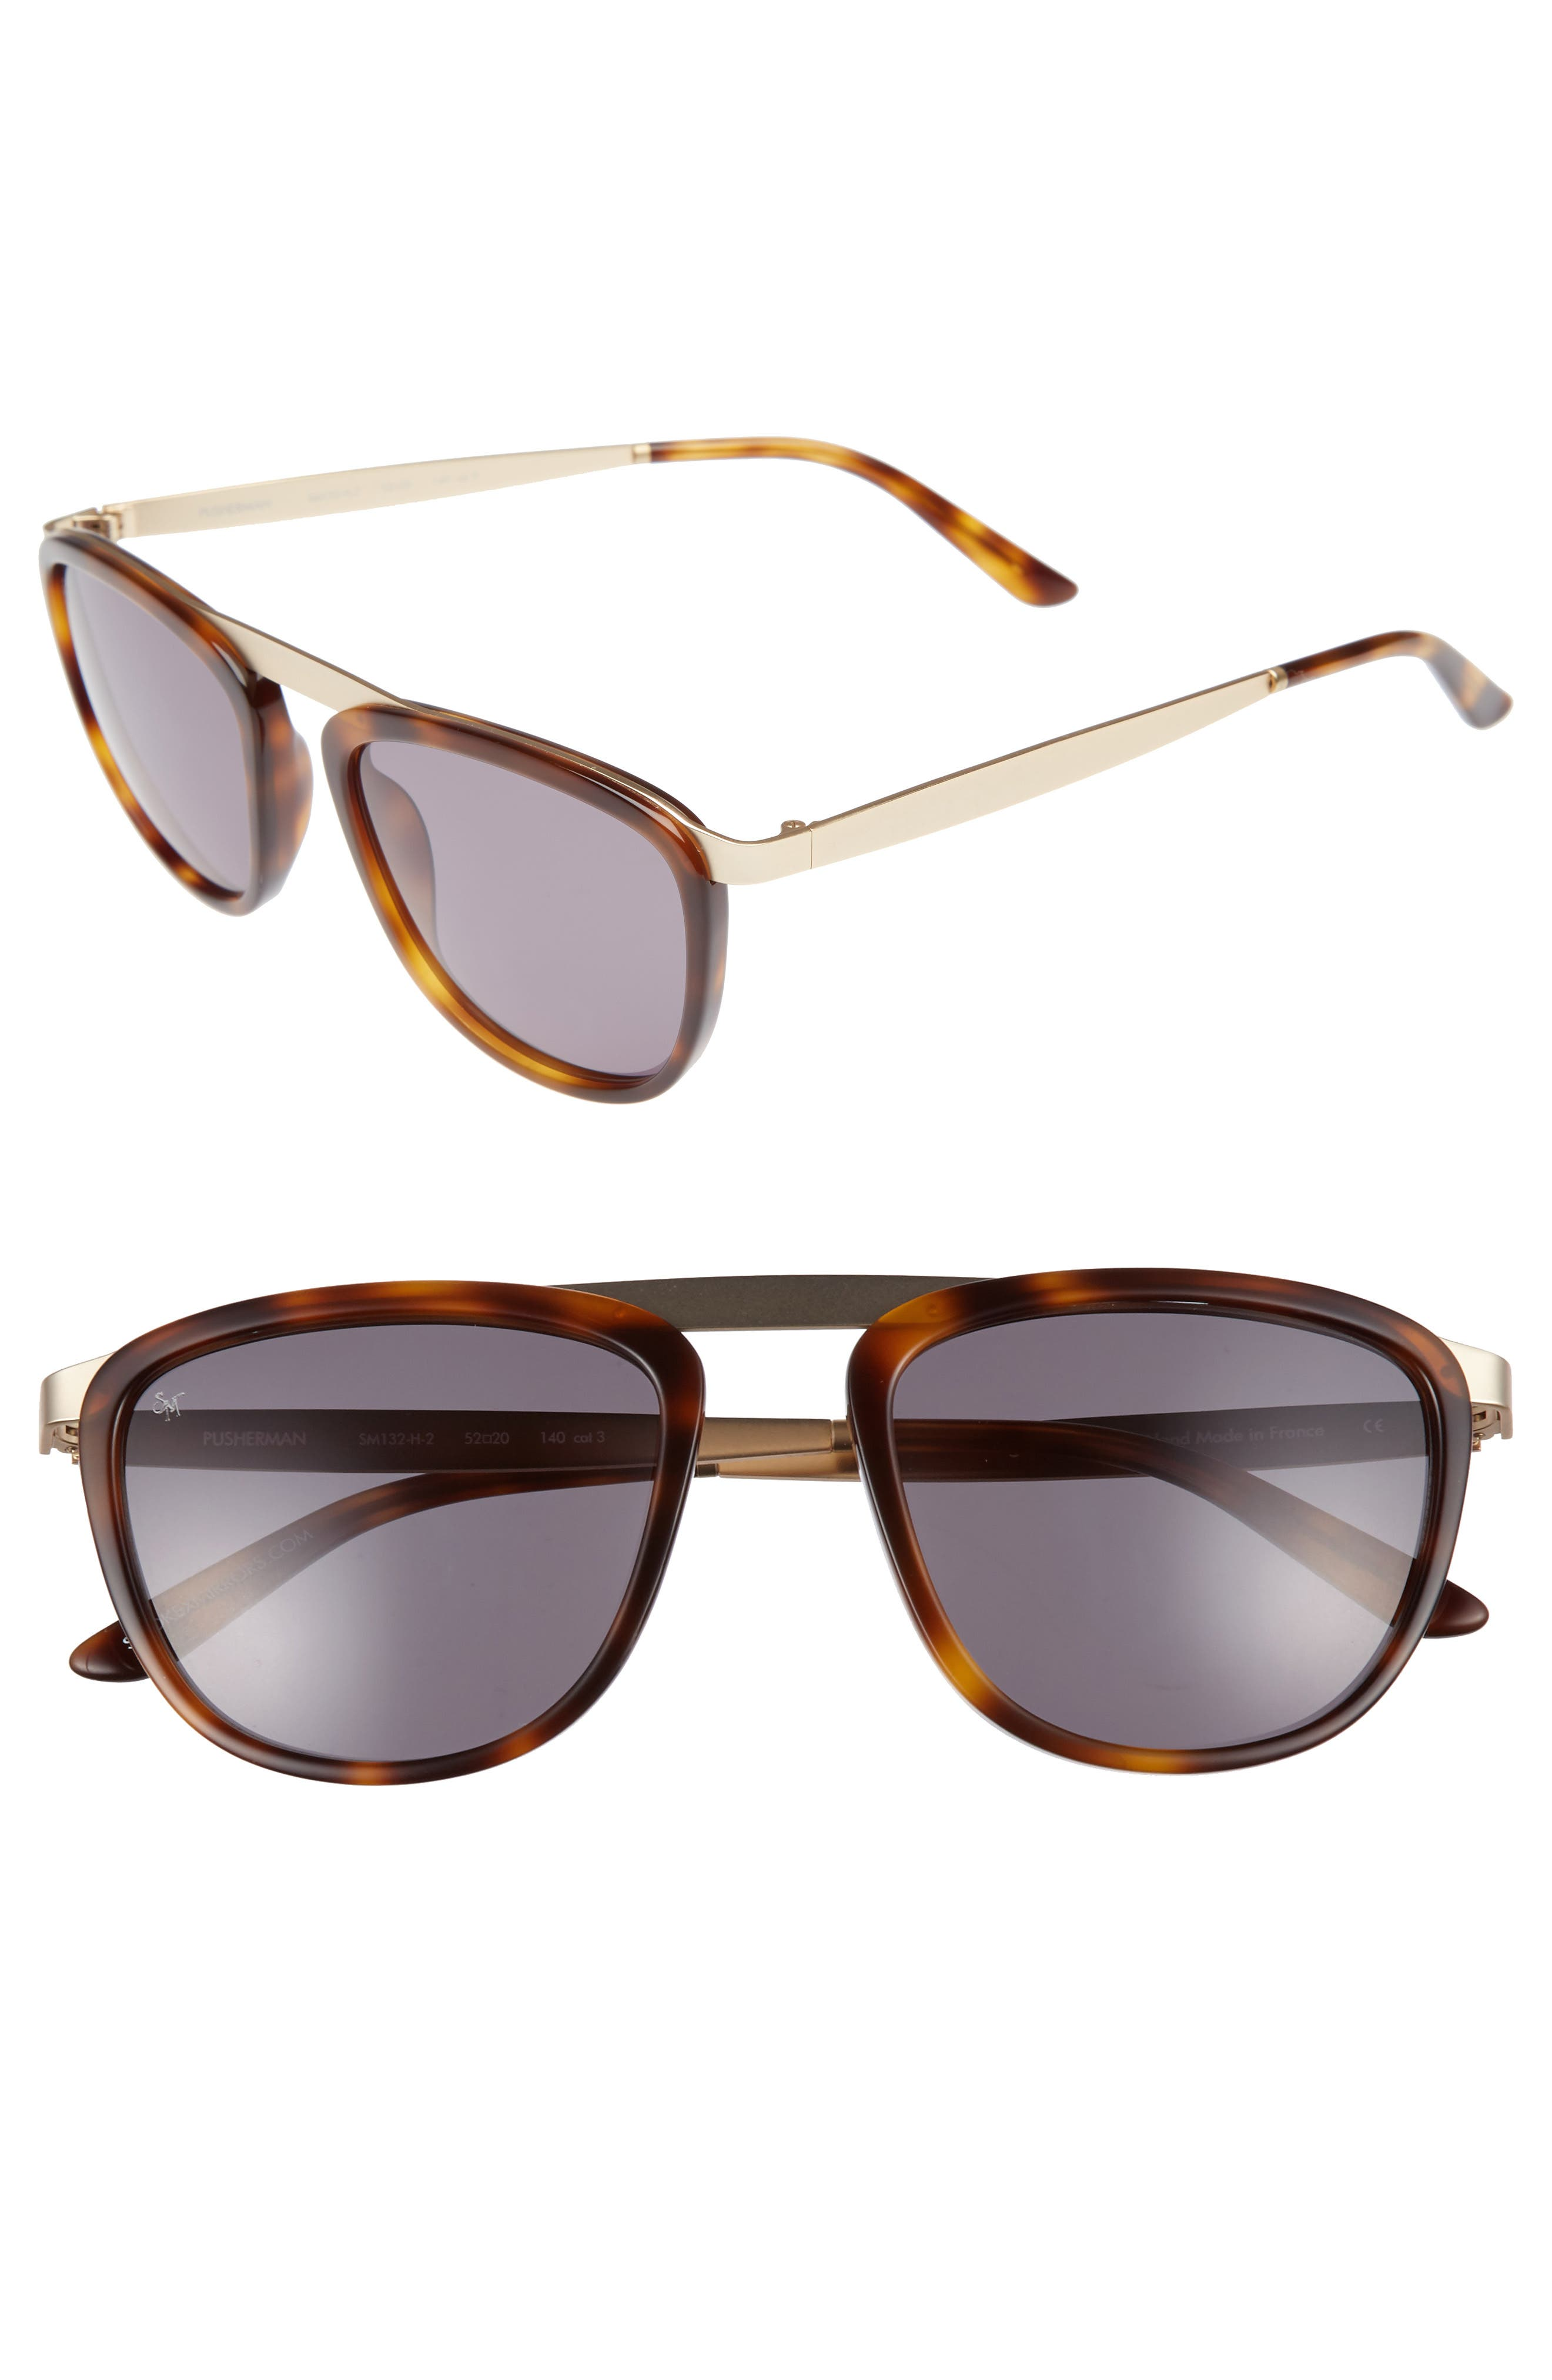 Pusherman 52mm Retro Sunglasses,                         Main,                         color, 200